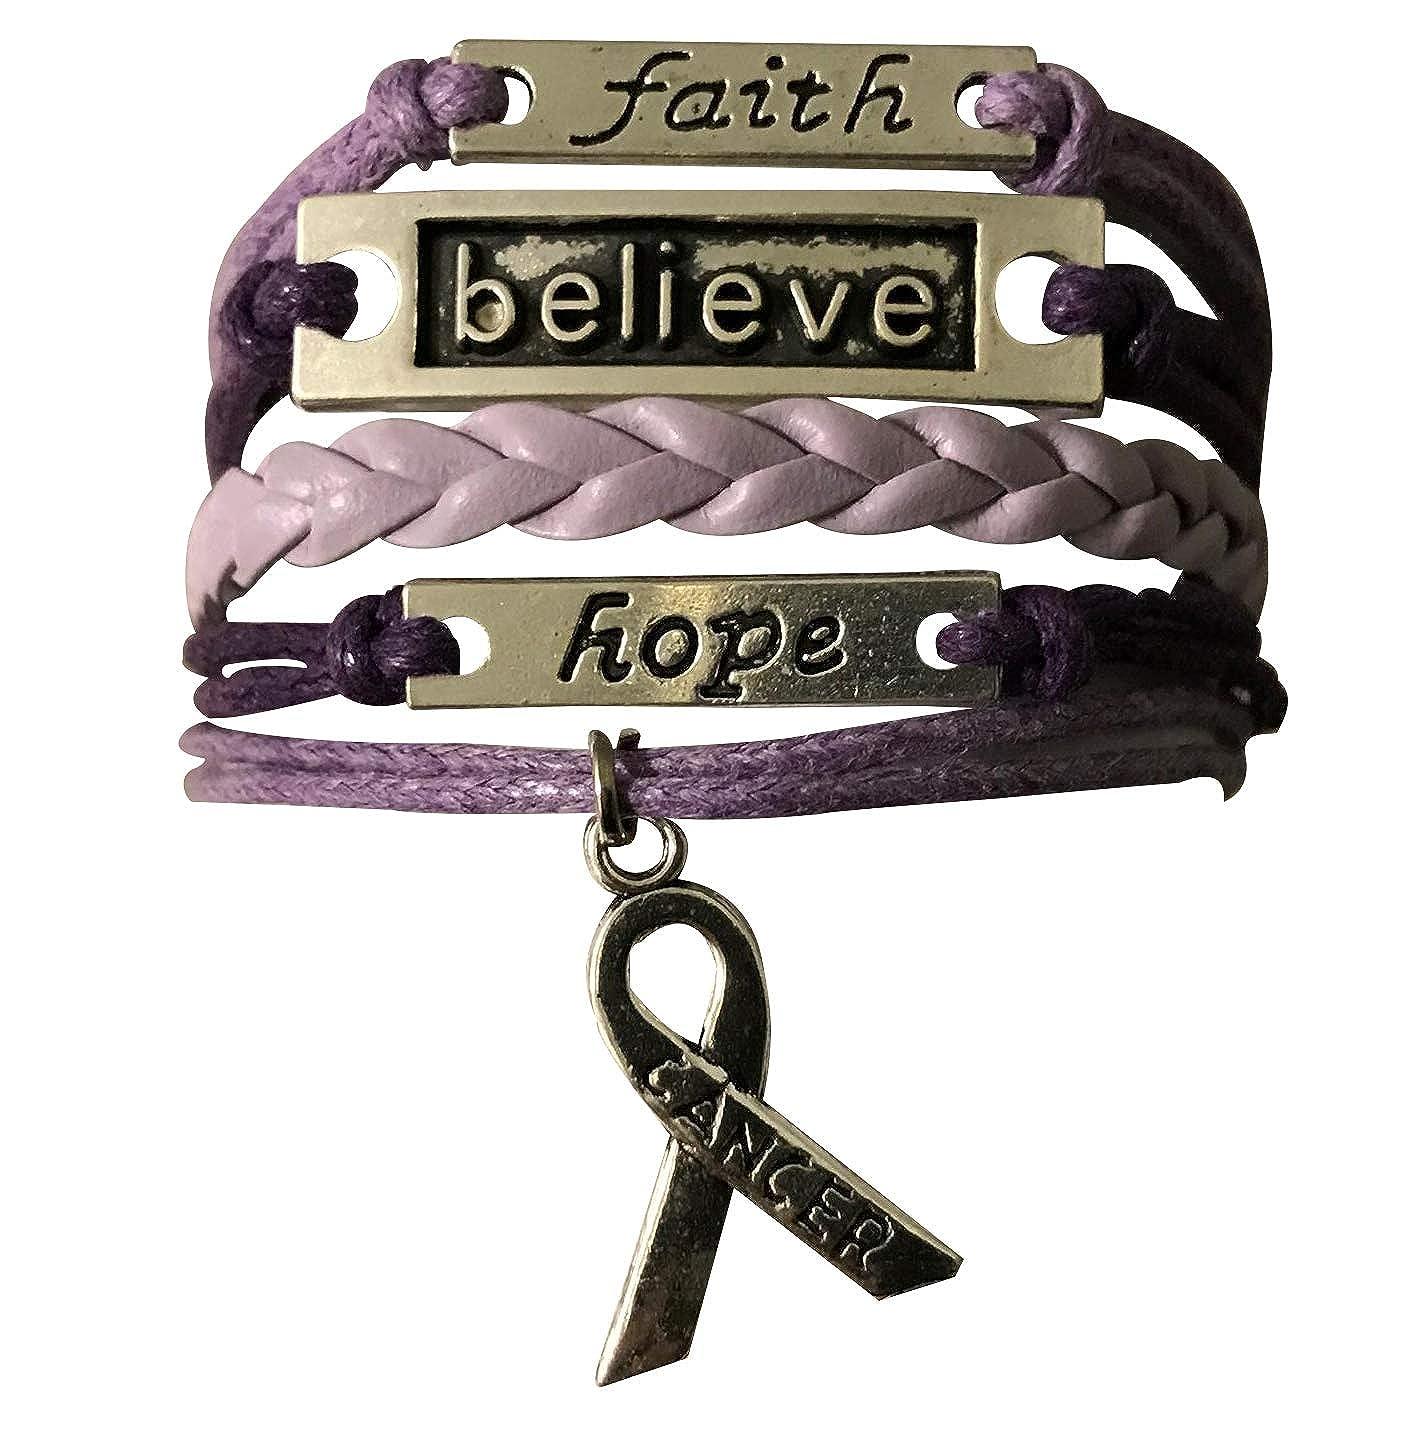 Infinity Collection Cancer Awareness Purple Ribbon Bracelet Pancreatic Cancer Bracelet Awareness Bracelet Makes The